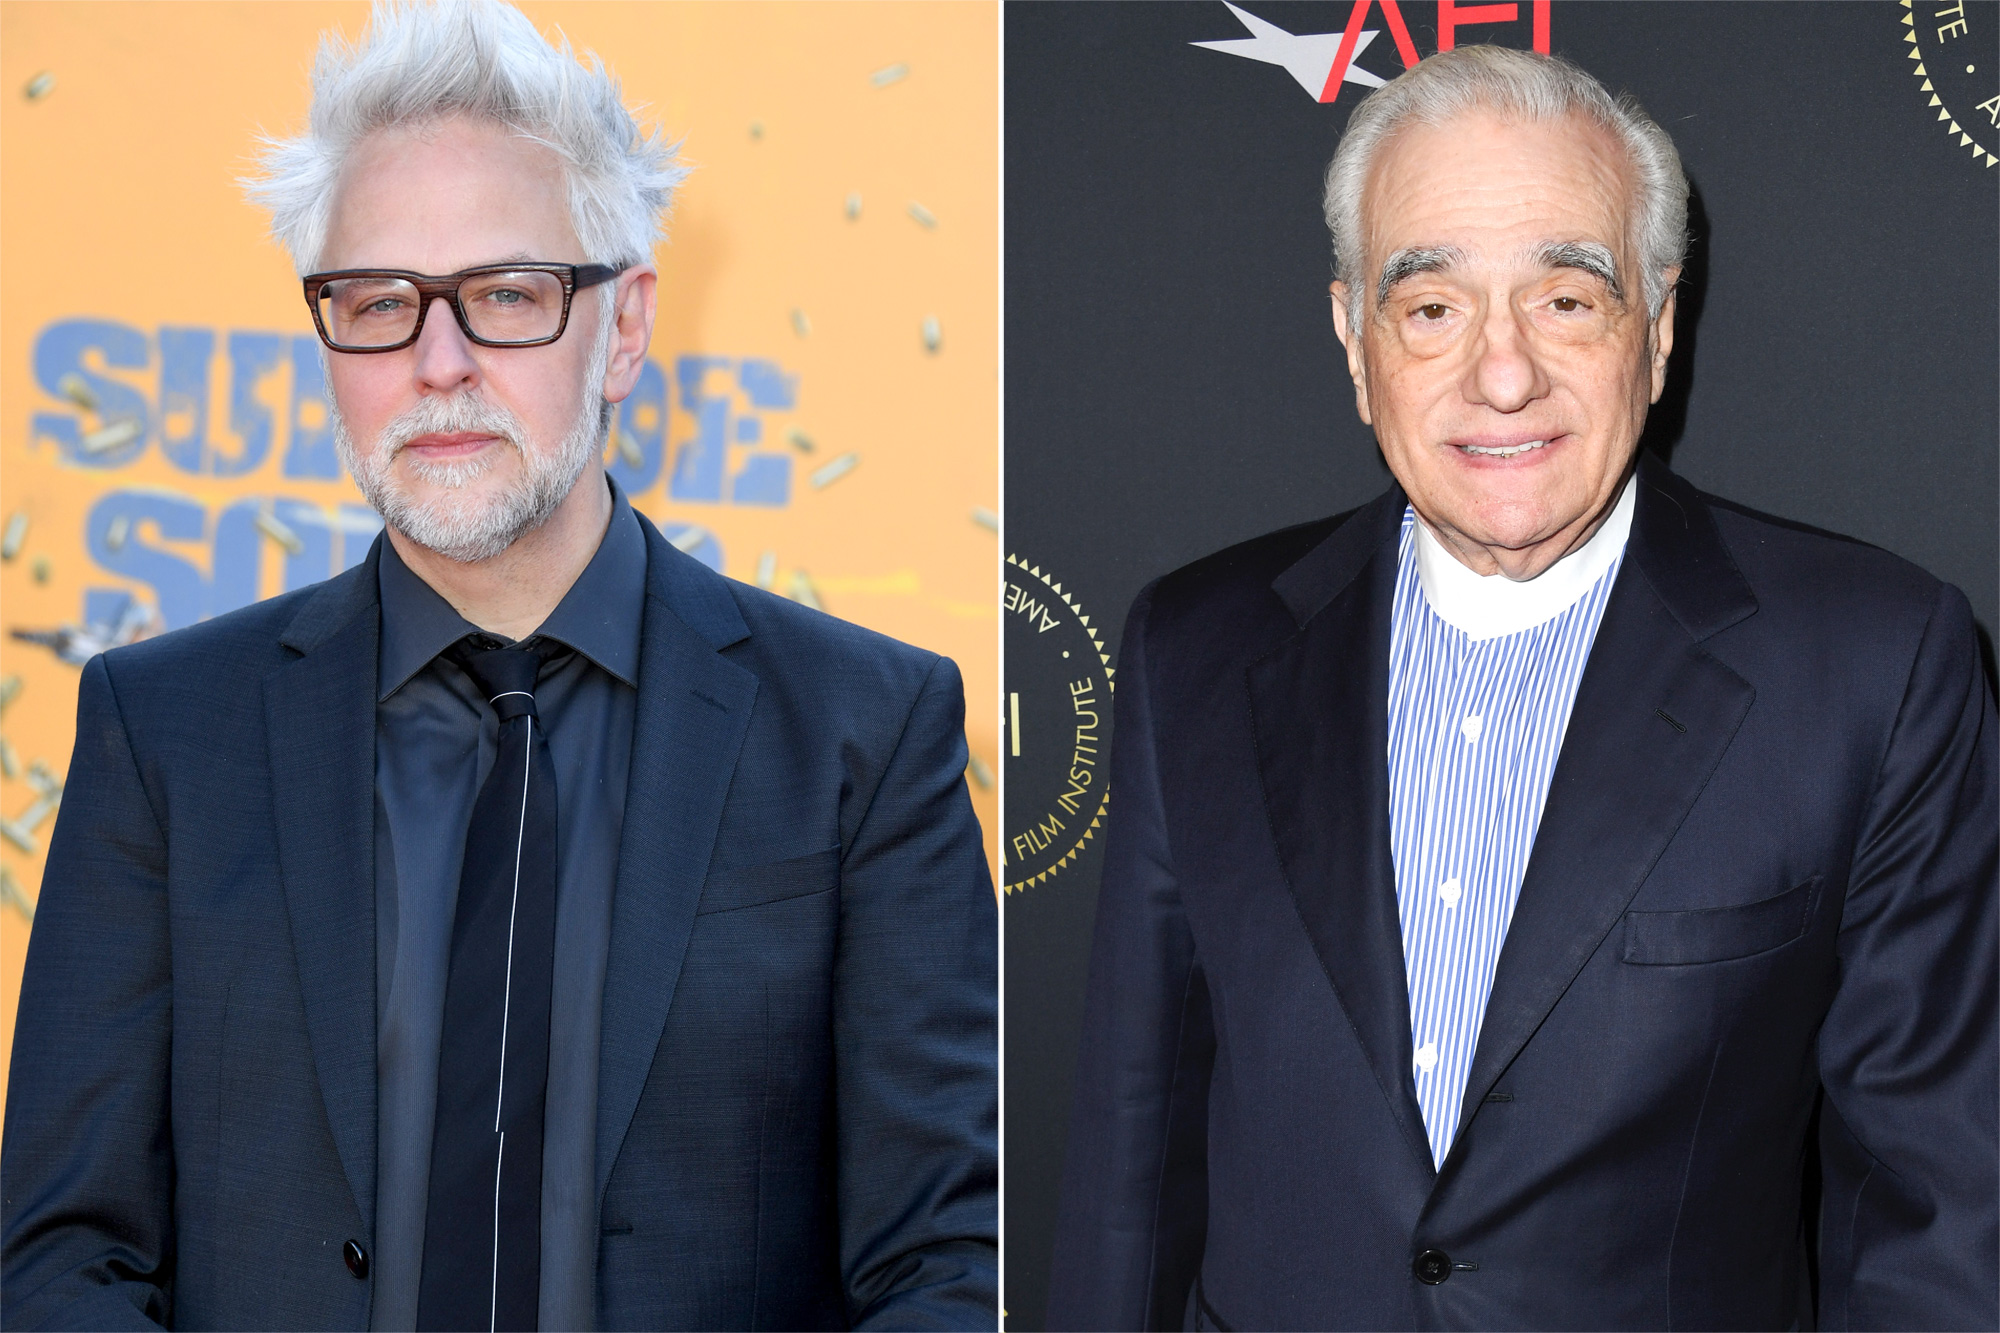 James Gunn says Martin Scorsese bashed Marvel movies to get press | EW.com